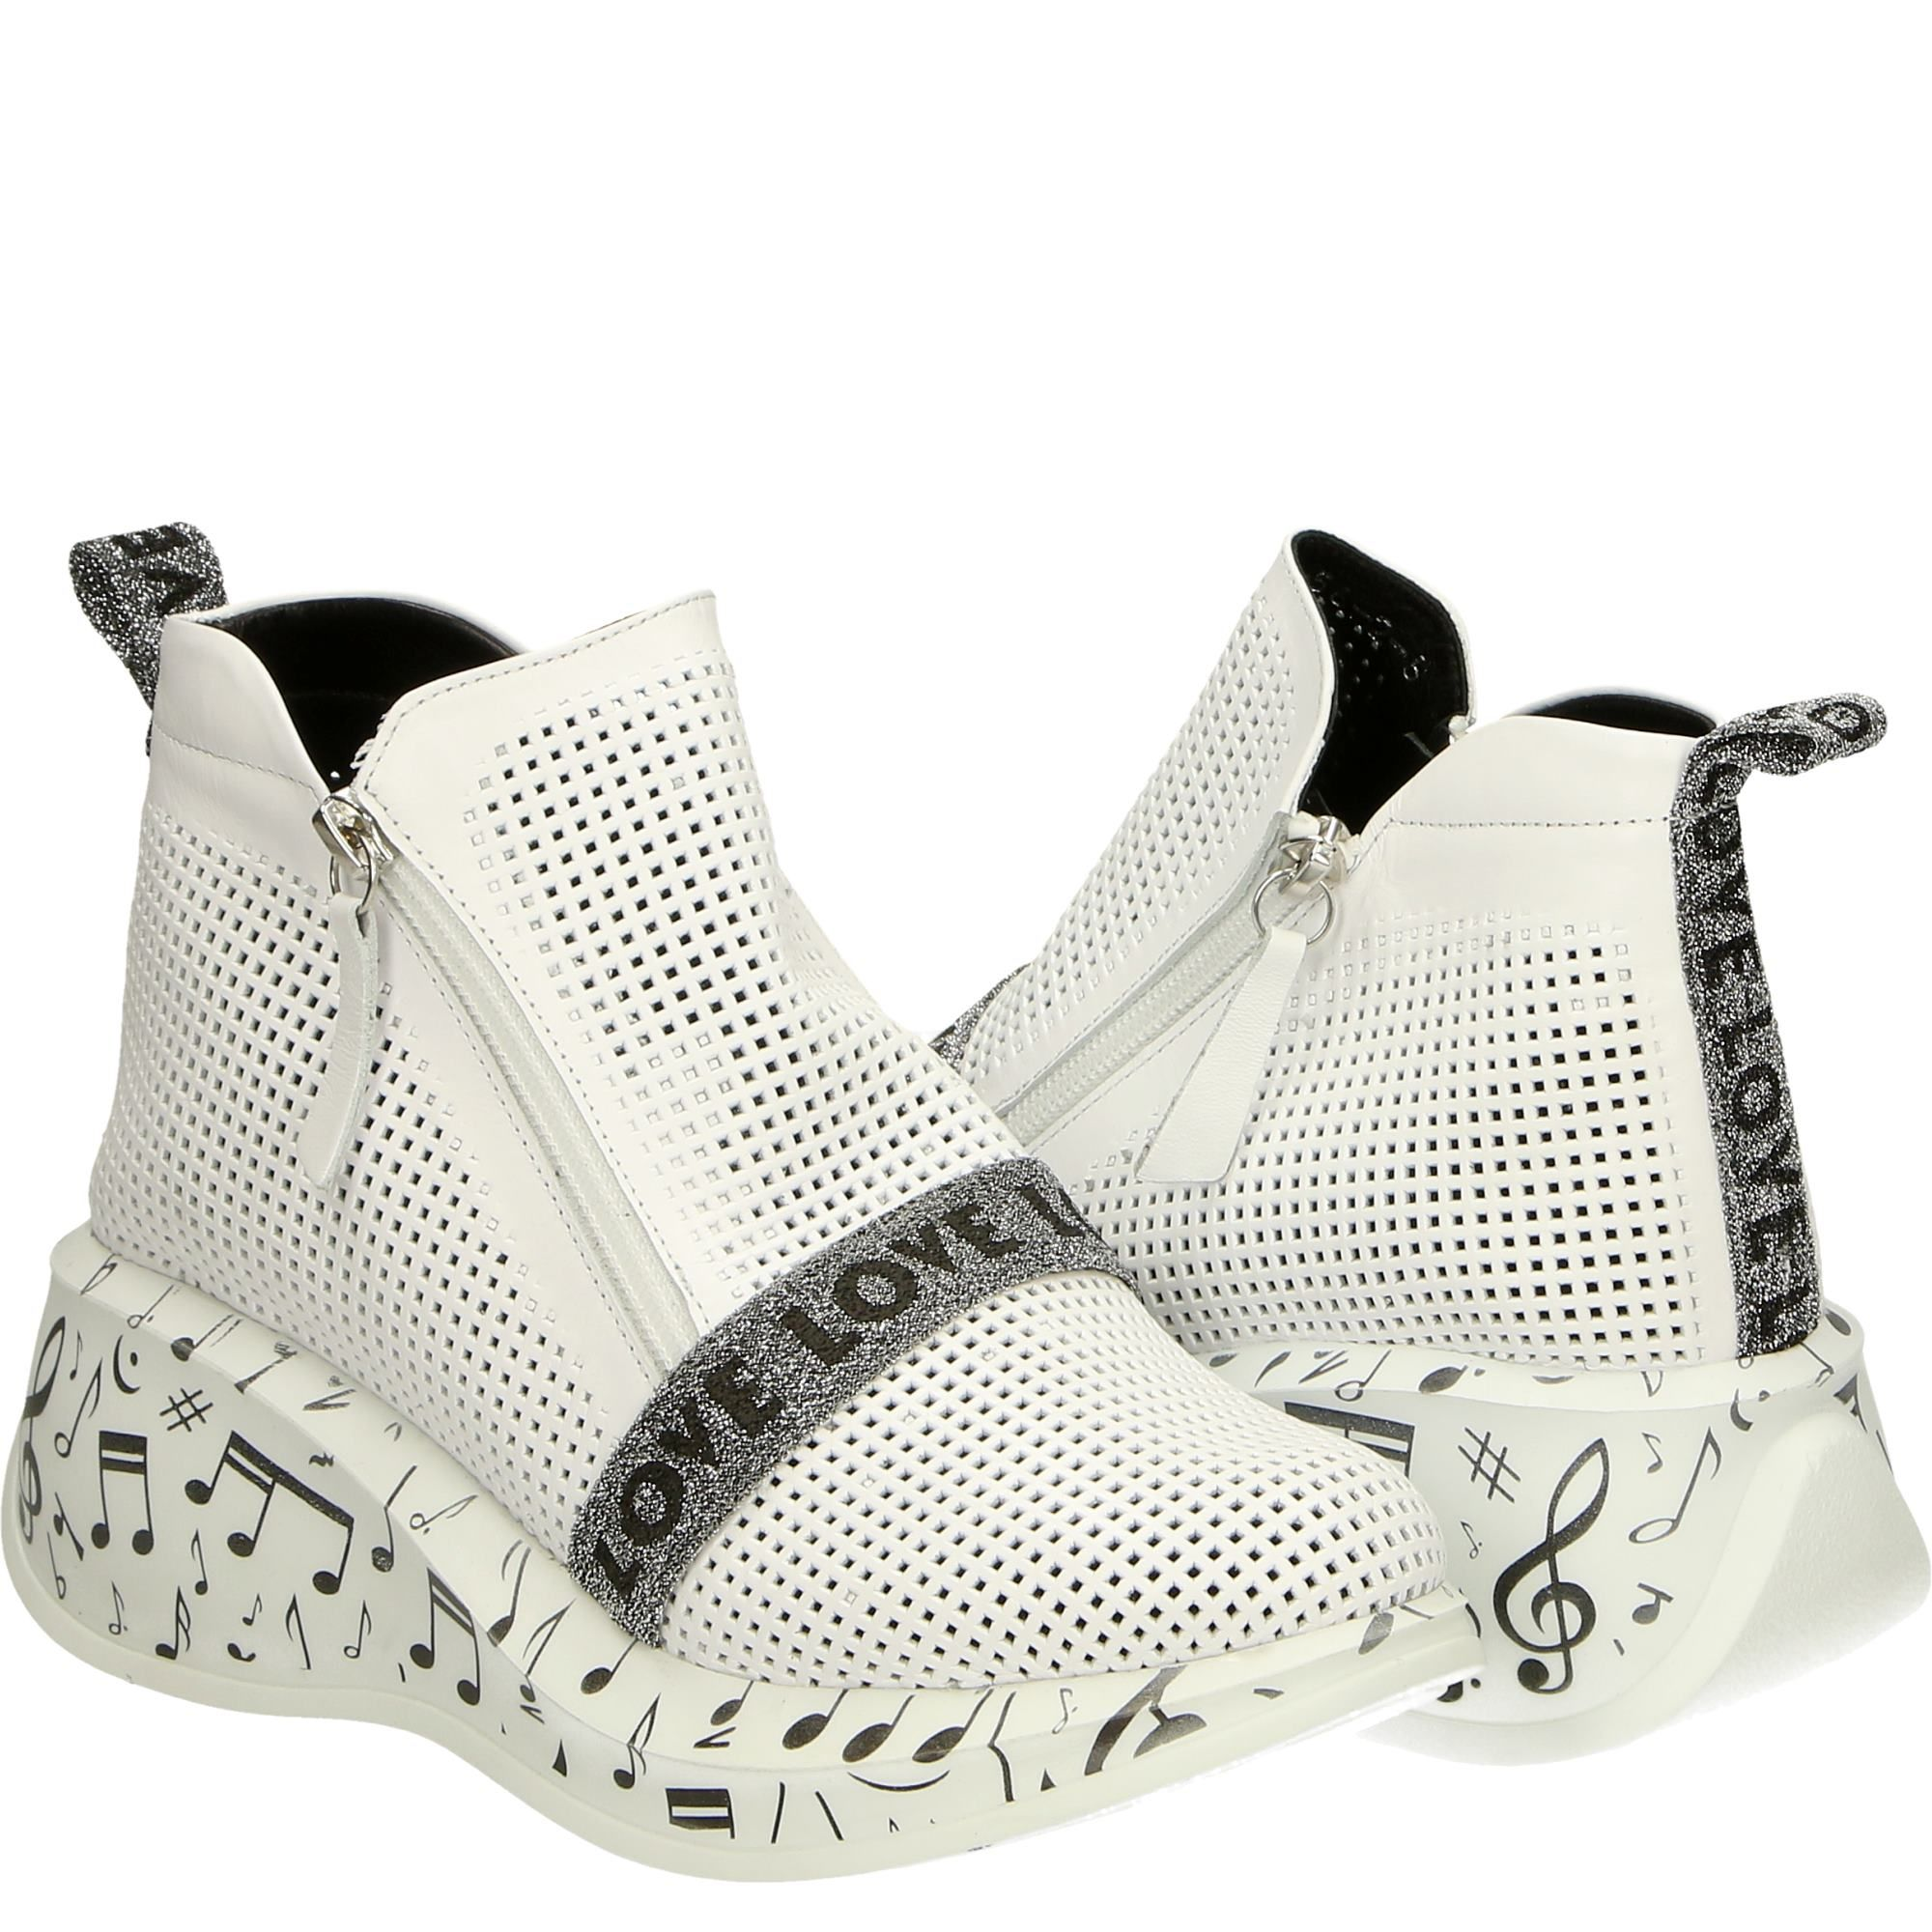 Venezia Firmowy Sklep Online Markowe Buty Online Obuwie Damskie Obuwie Meskie Torby Damskie Kurtki Da Puma Fierce Sneaker High Top Sneakers Top Sneakers